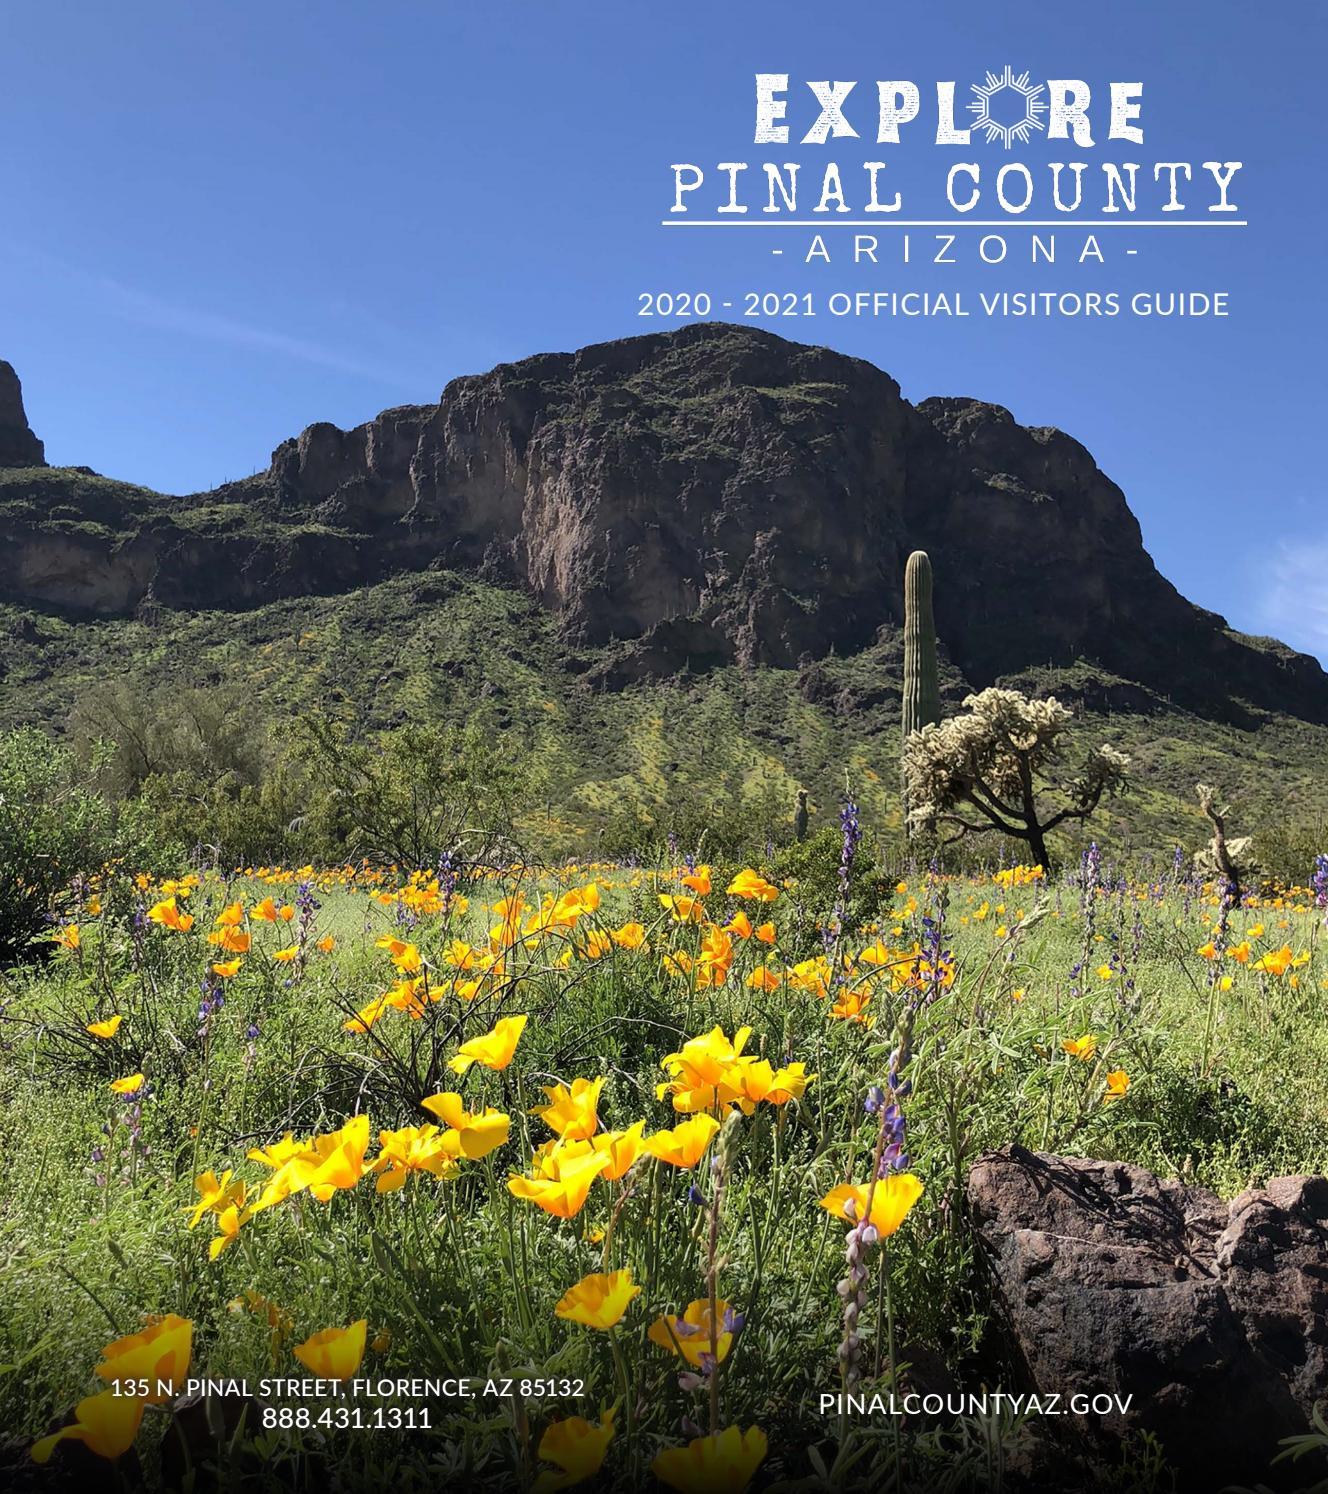 2020 2021 Pinal County Visitors Guide By Rox Media Group Issuu How can i go arizona nature aquatics? 2020 2021 pinal county visitors guide